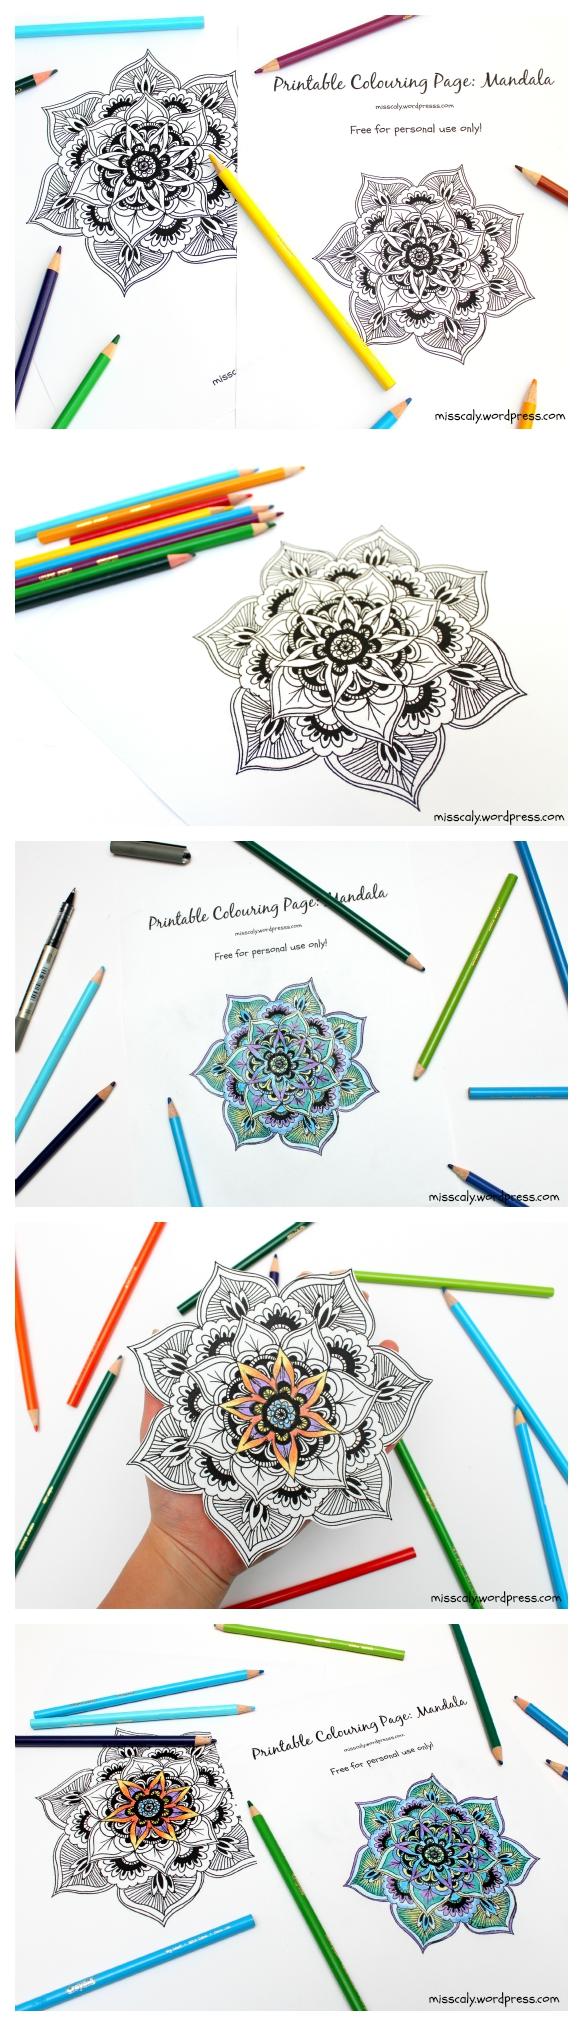 Printable colouring Mandala